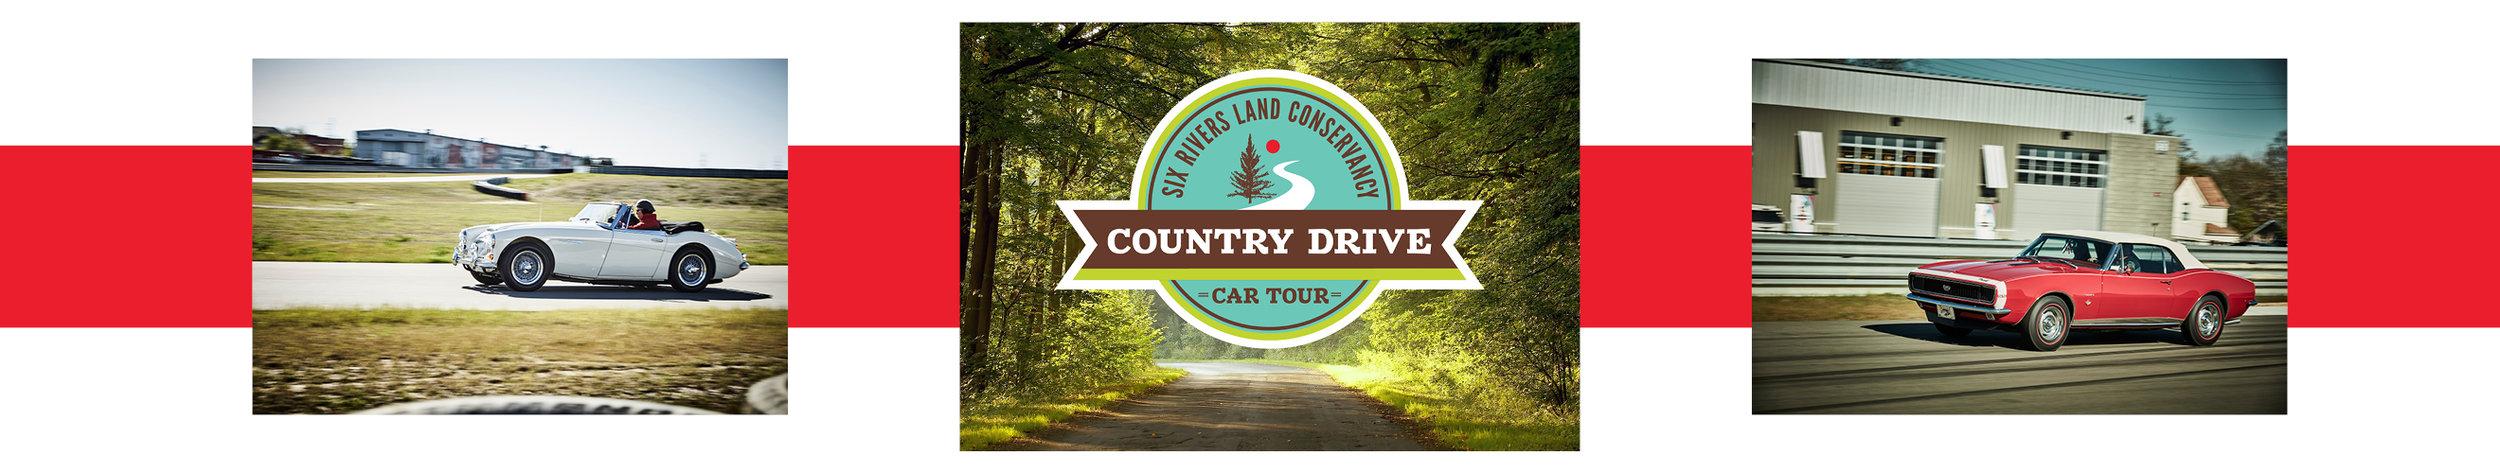 Car Tour Email Banner.jpg